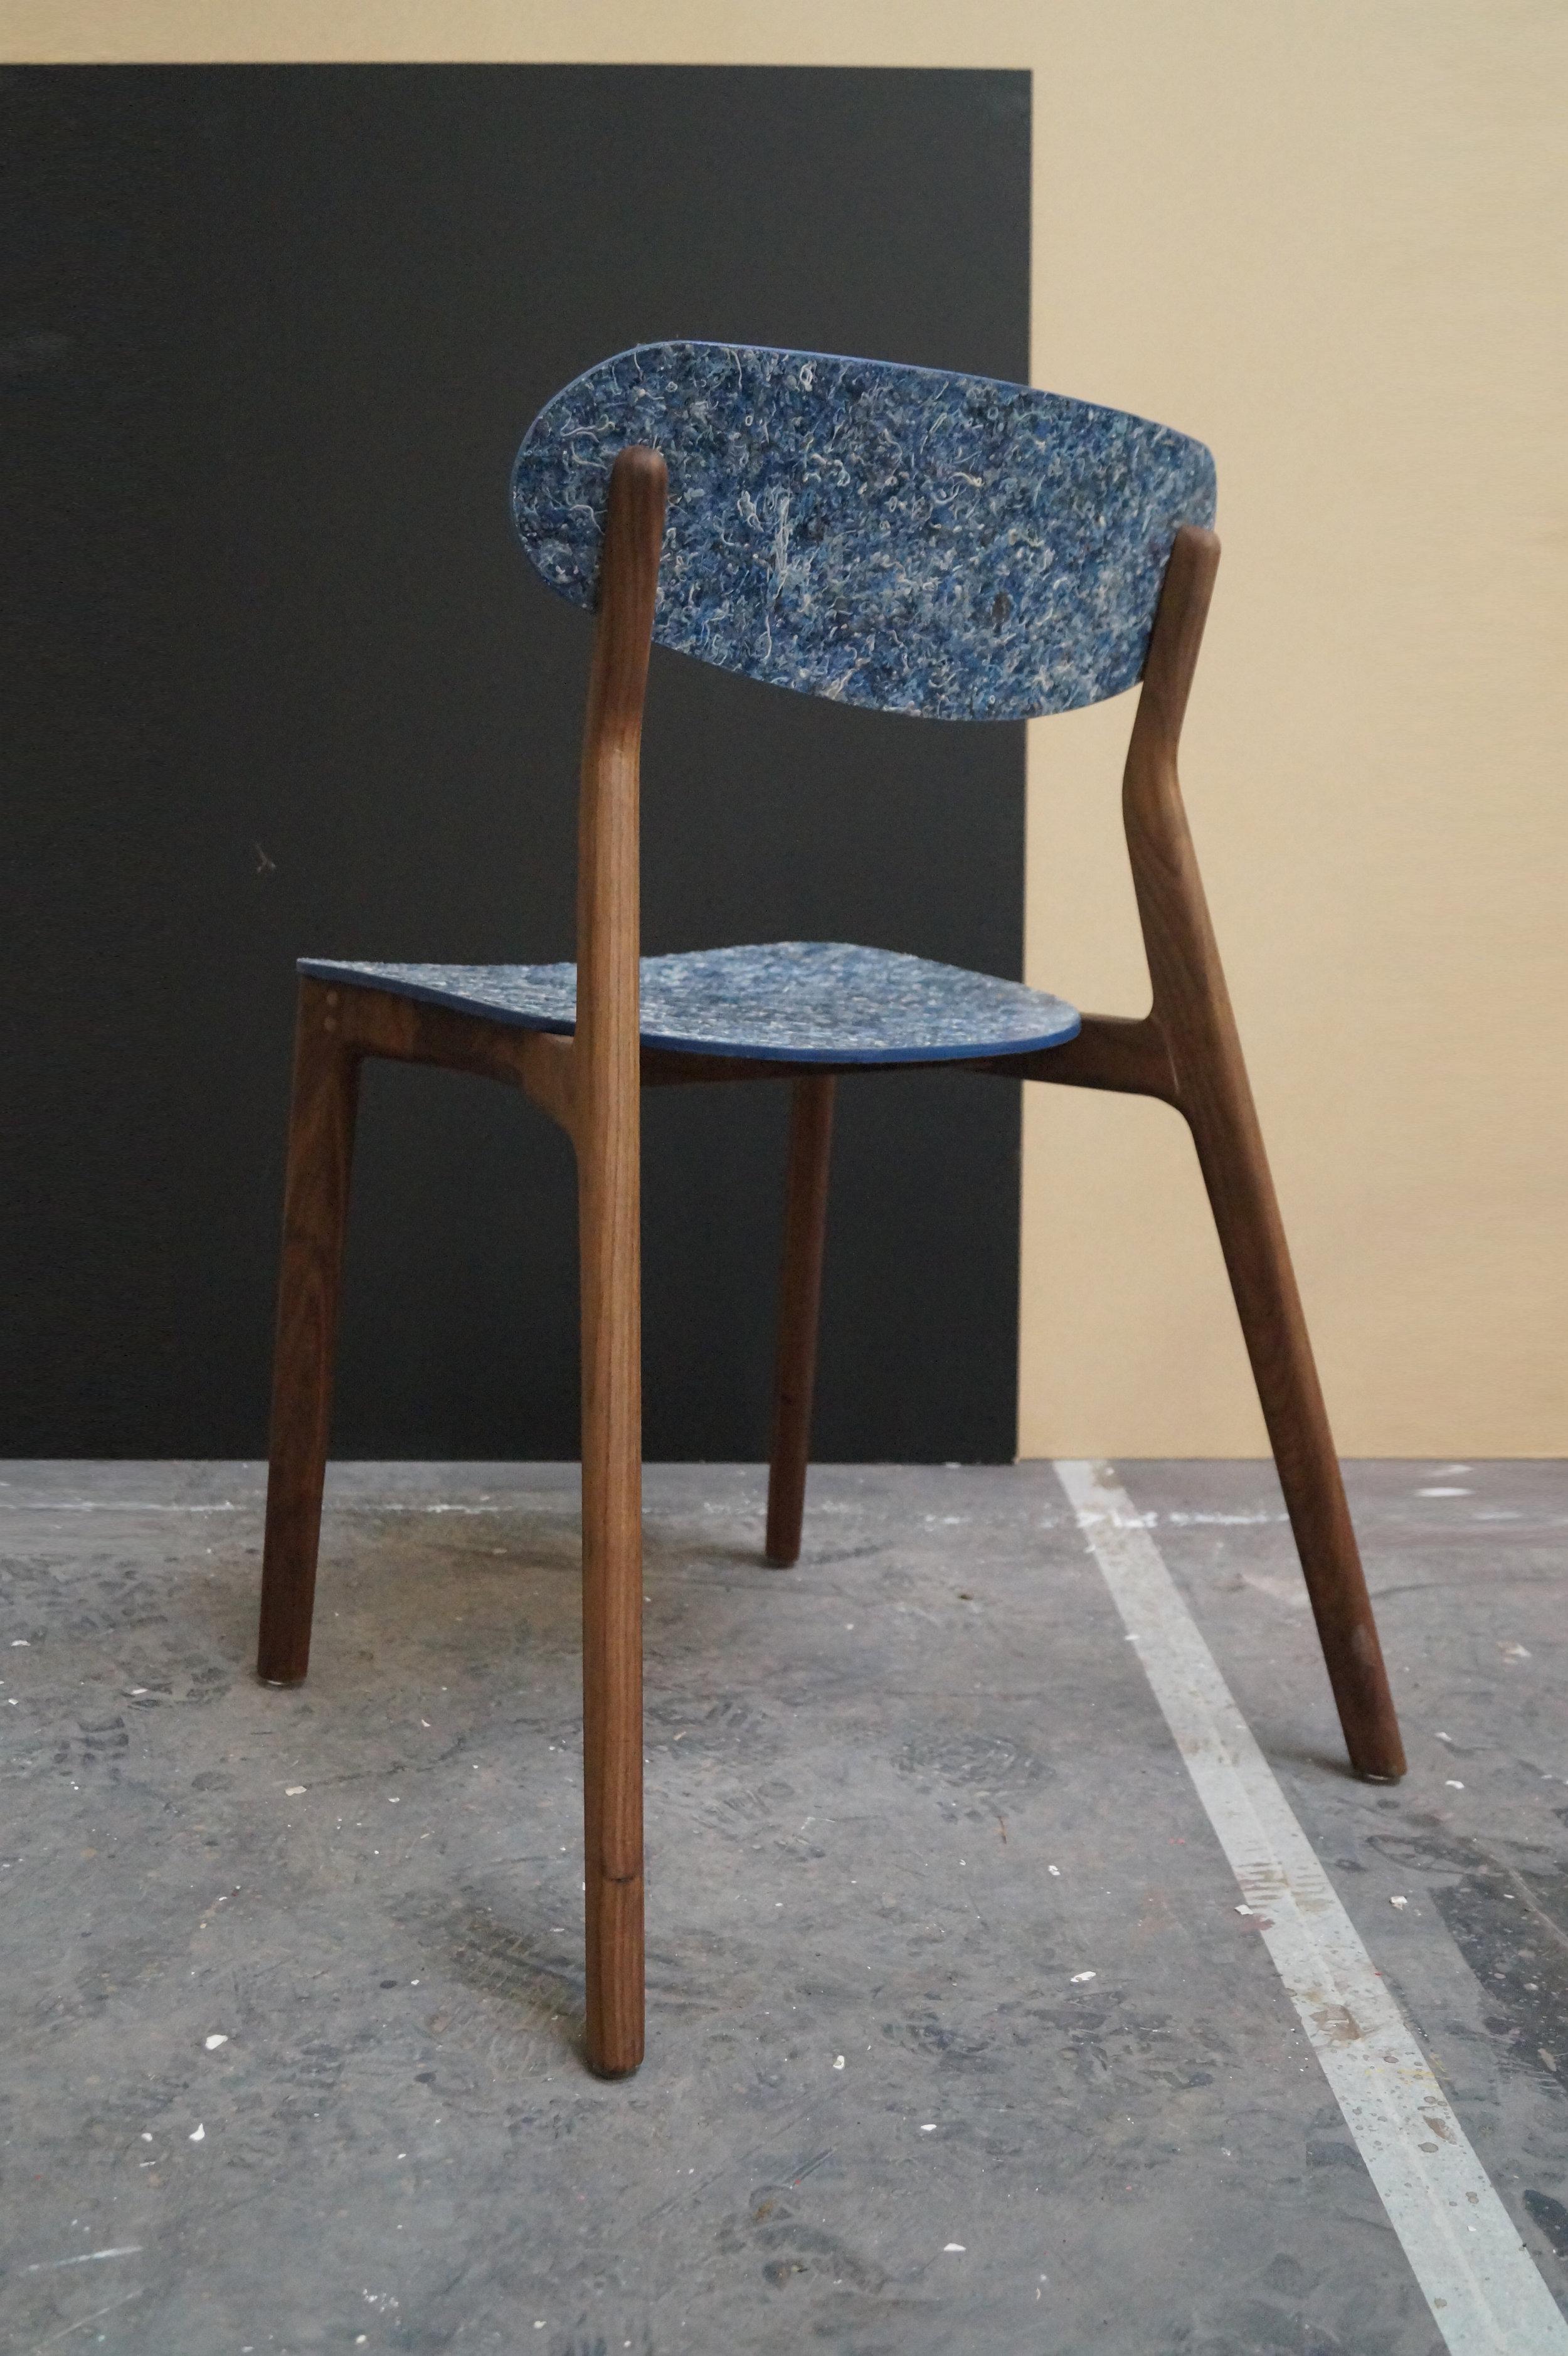 Ubu_Chair_Iso_03.jpg